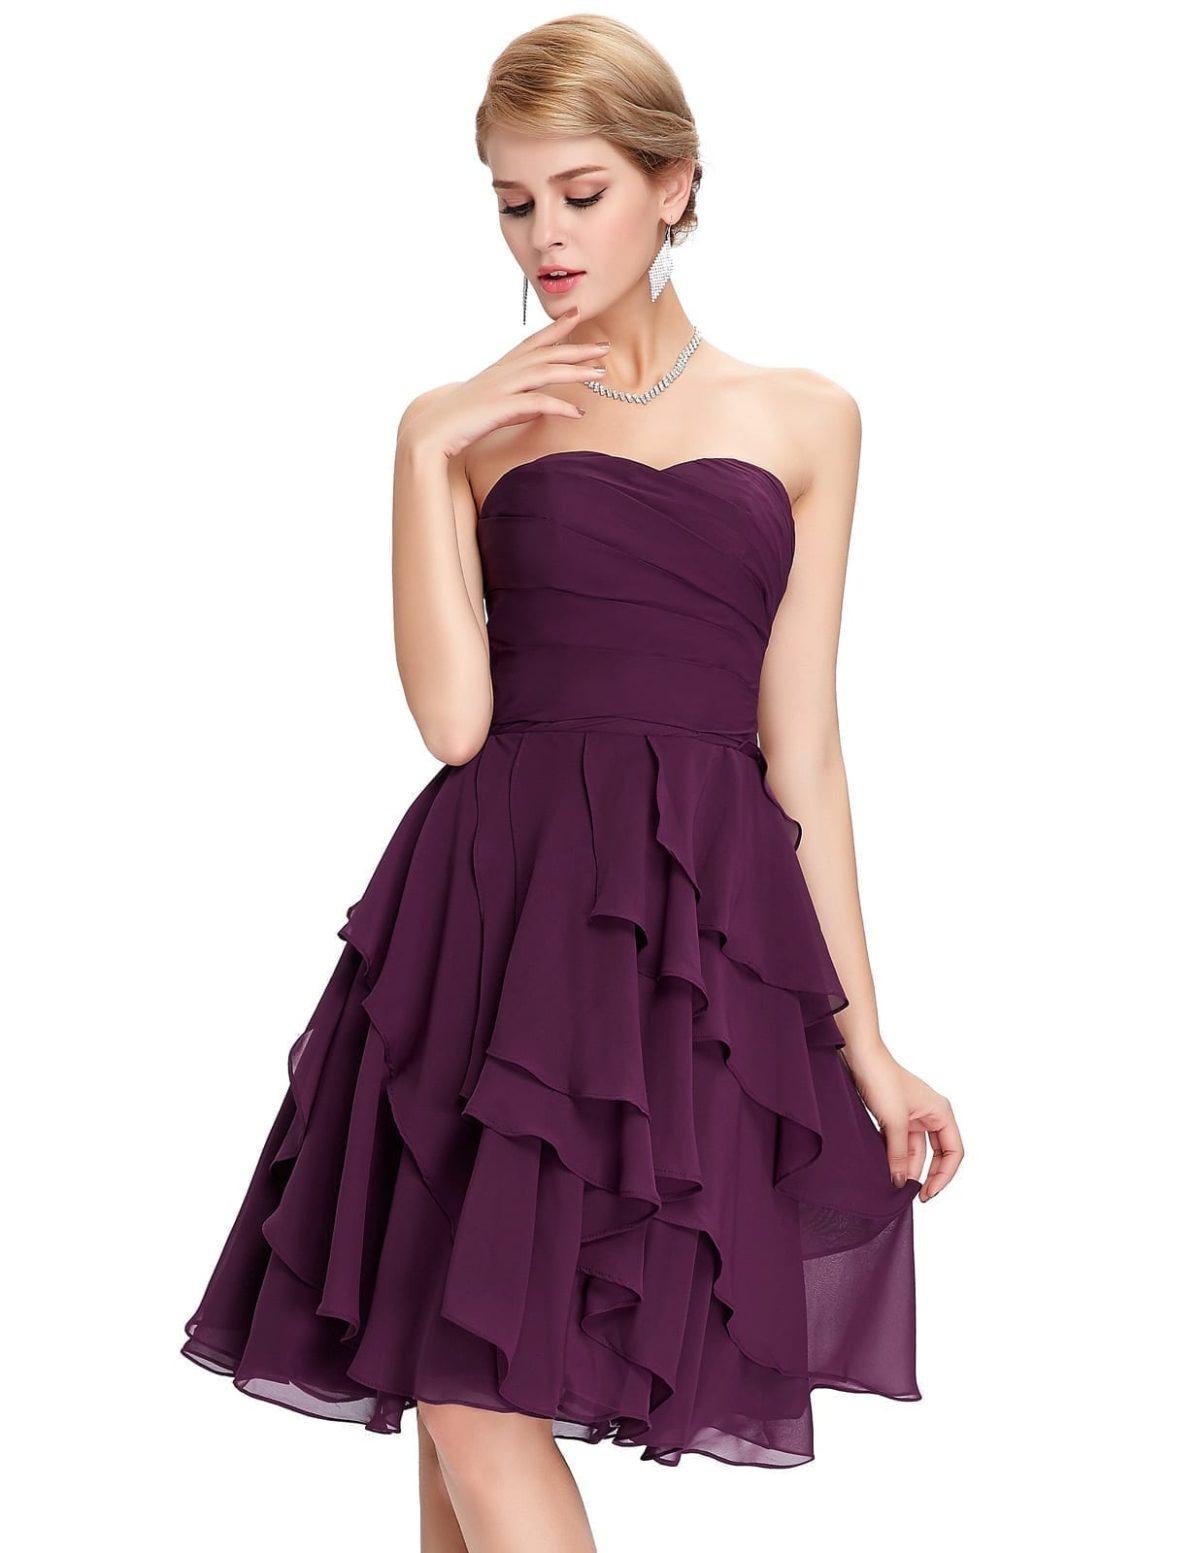 Short Purple A-line Knee-length Bridesmaid Dress